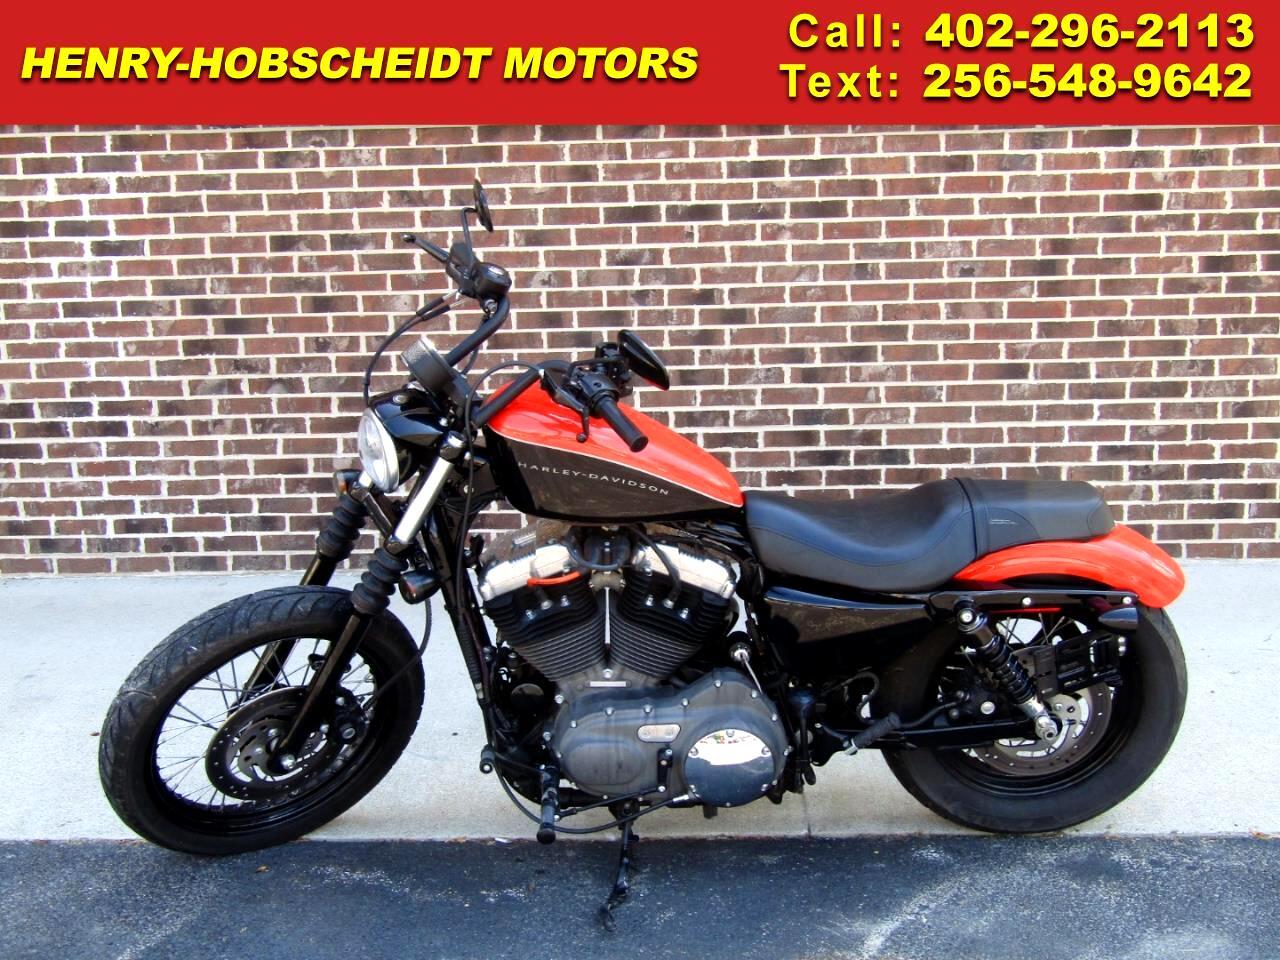 2008 Harley-Davidson XL1200N Nightster